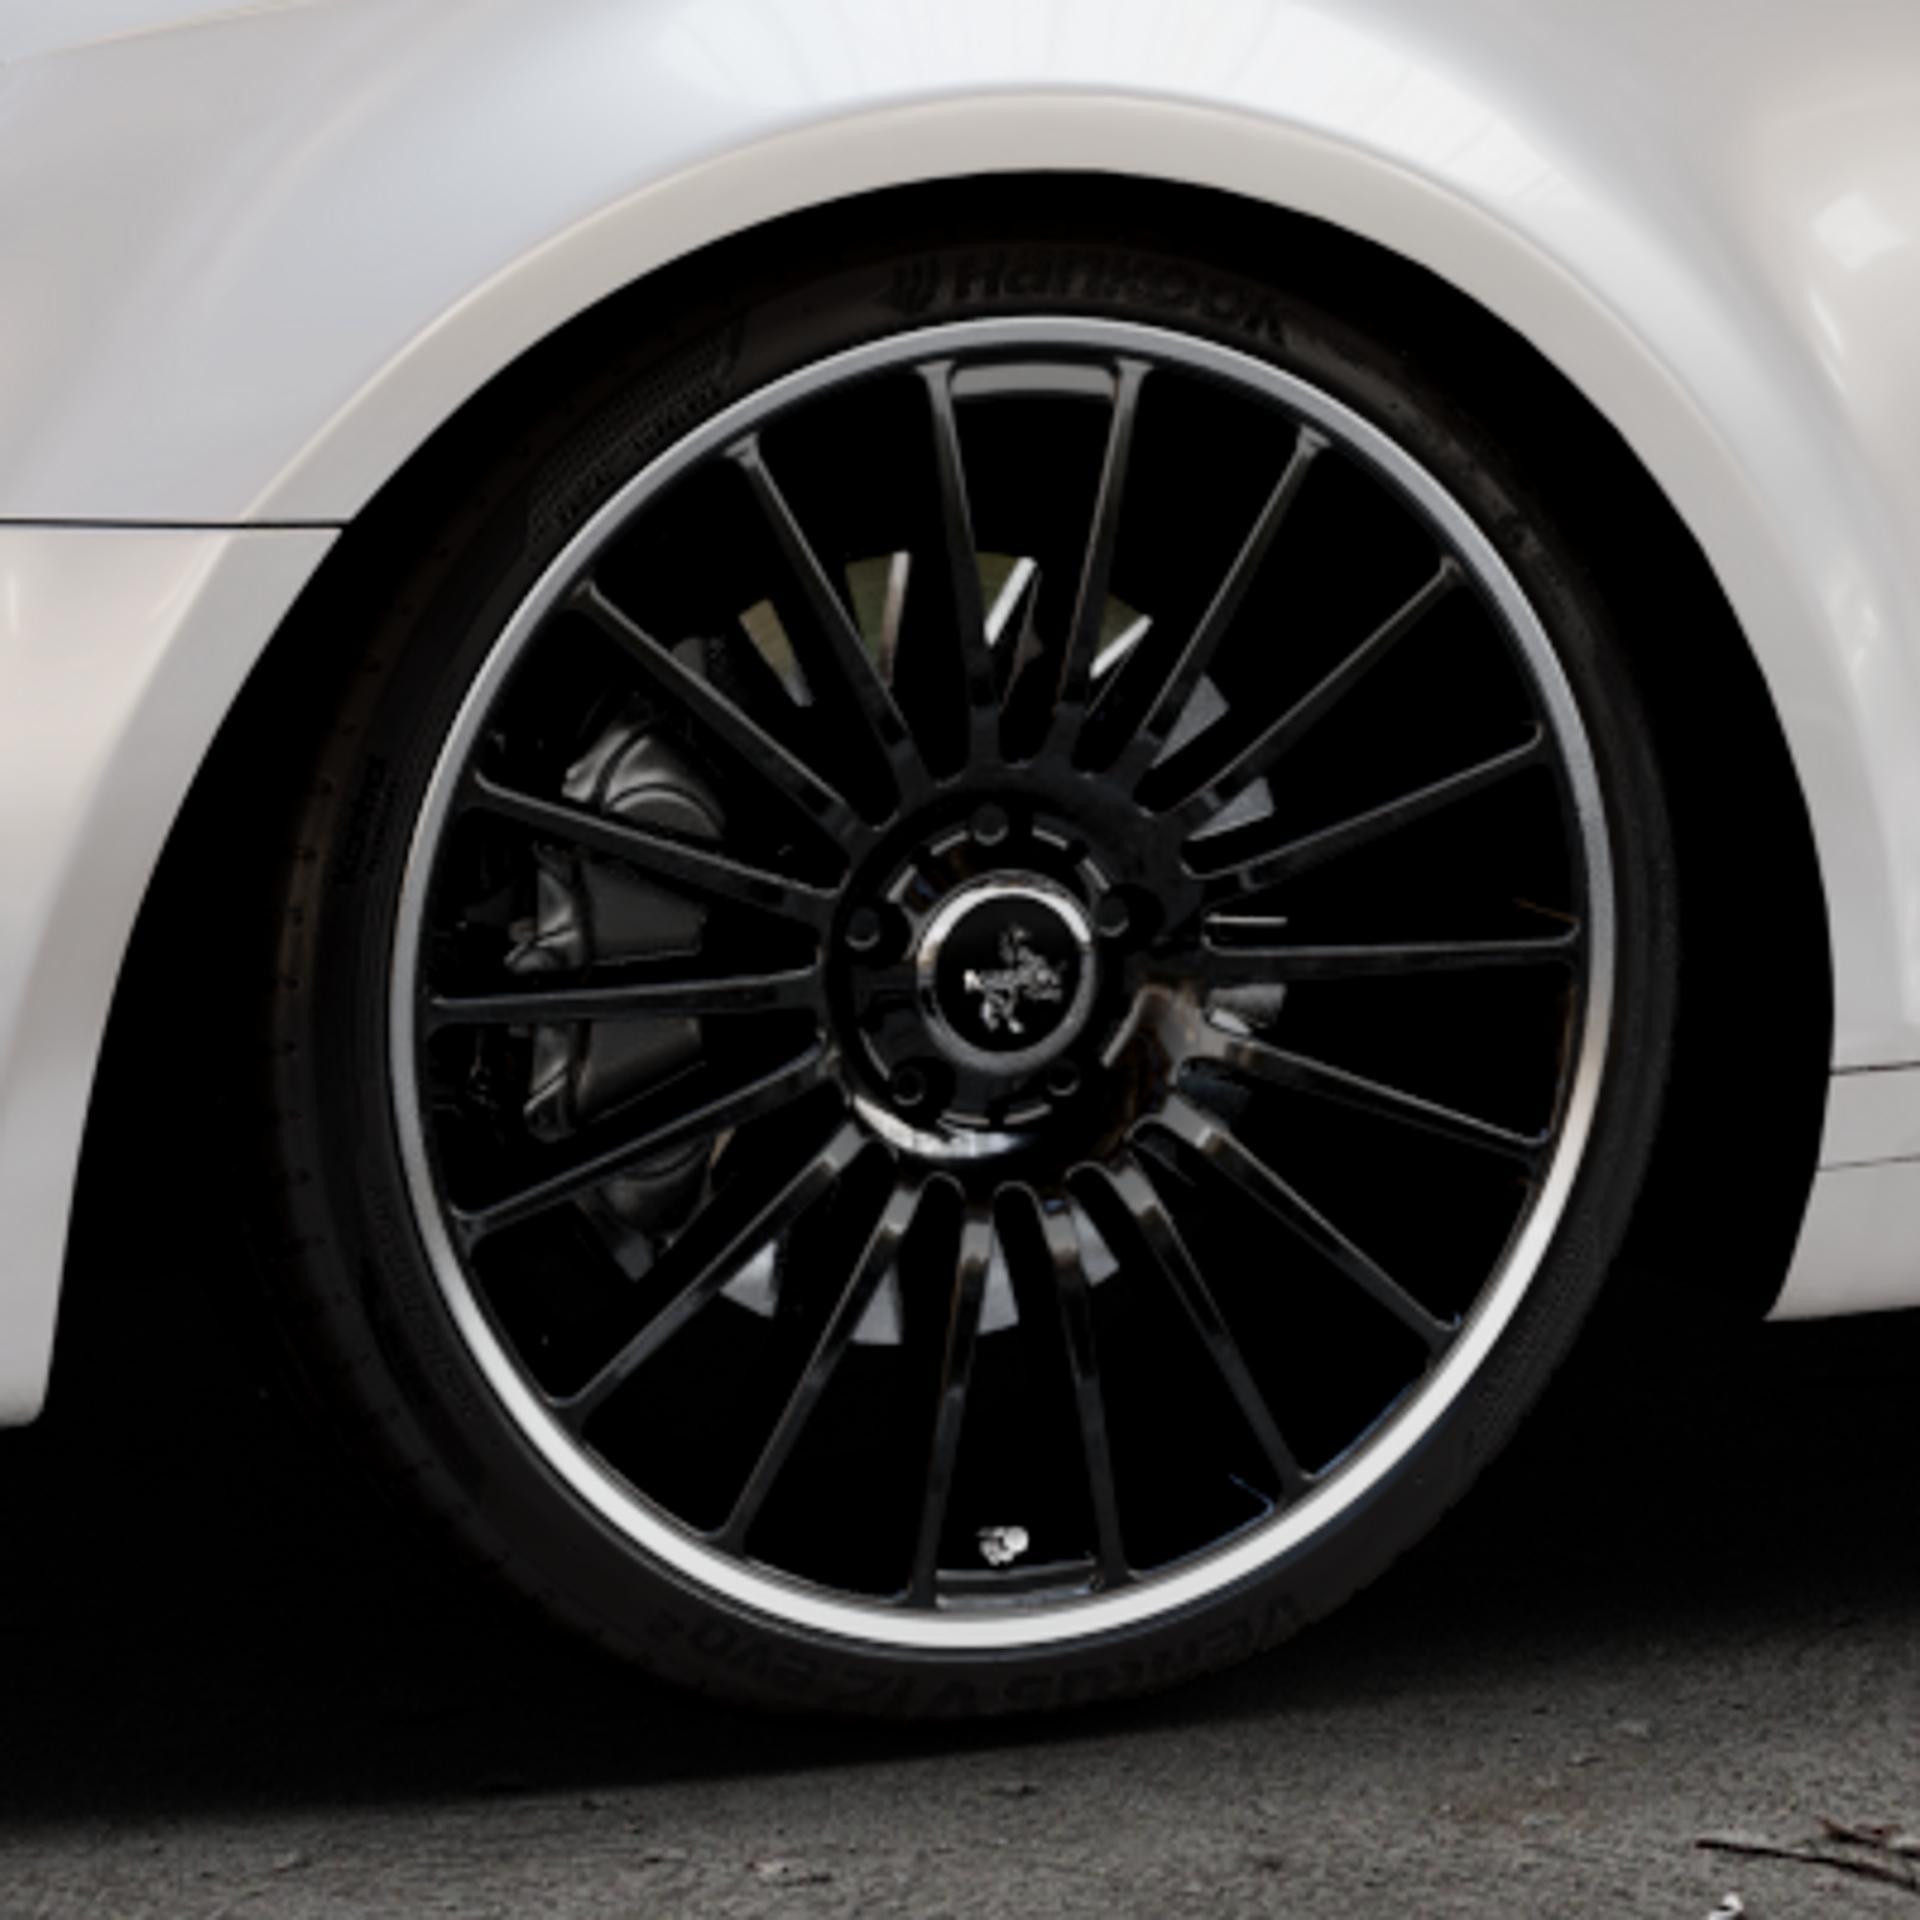 KESKIN KT15 BLACK LIP POLISH Felge mit Reifen silber schwarz mehrfarbig in 19Zoll Winterfelge Alufelge auf weissem Audi A3 Typ 8P (Sportback) 1,6l 75kW (102 PS) 2,0l FSI 110kW (150 1,9l TDI 77kW (105 103kW (140 TFSI 147kW (200 85kW (116 100kW (136 1,8l 118kW (160 125kW (170 1,4l 92kW (125 120kW (163 quattro 3,2l V6 184kW (250 S3 195kW (265 1,2l 66kW (90 18